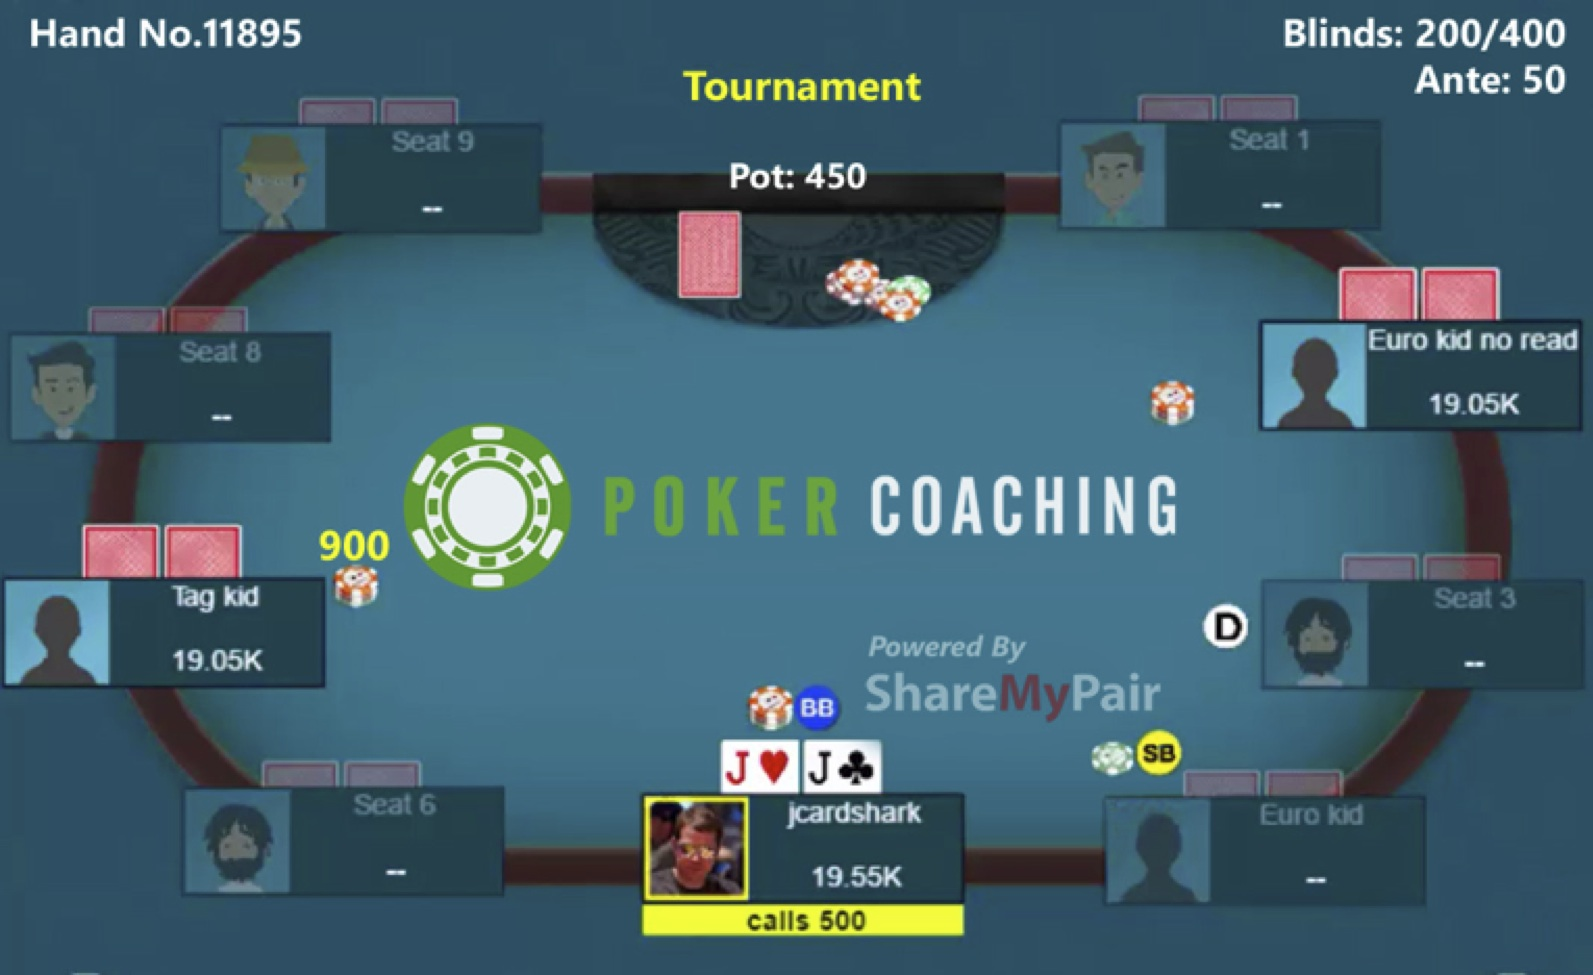 Poker Coaching mit Jonathan Little: So spielt man Pocket Jacks 101